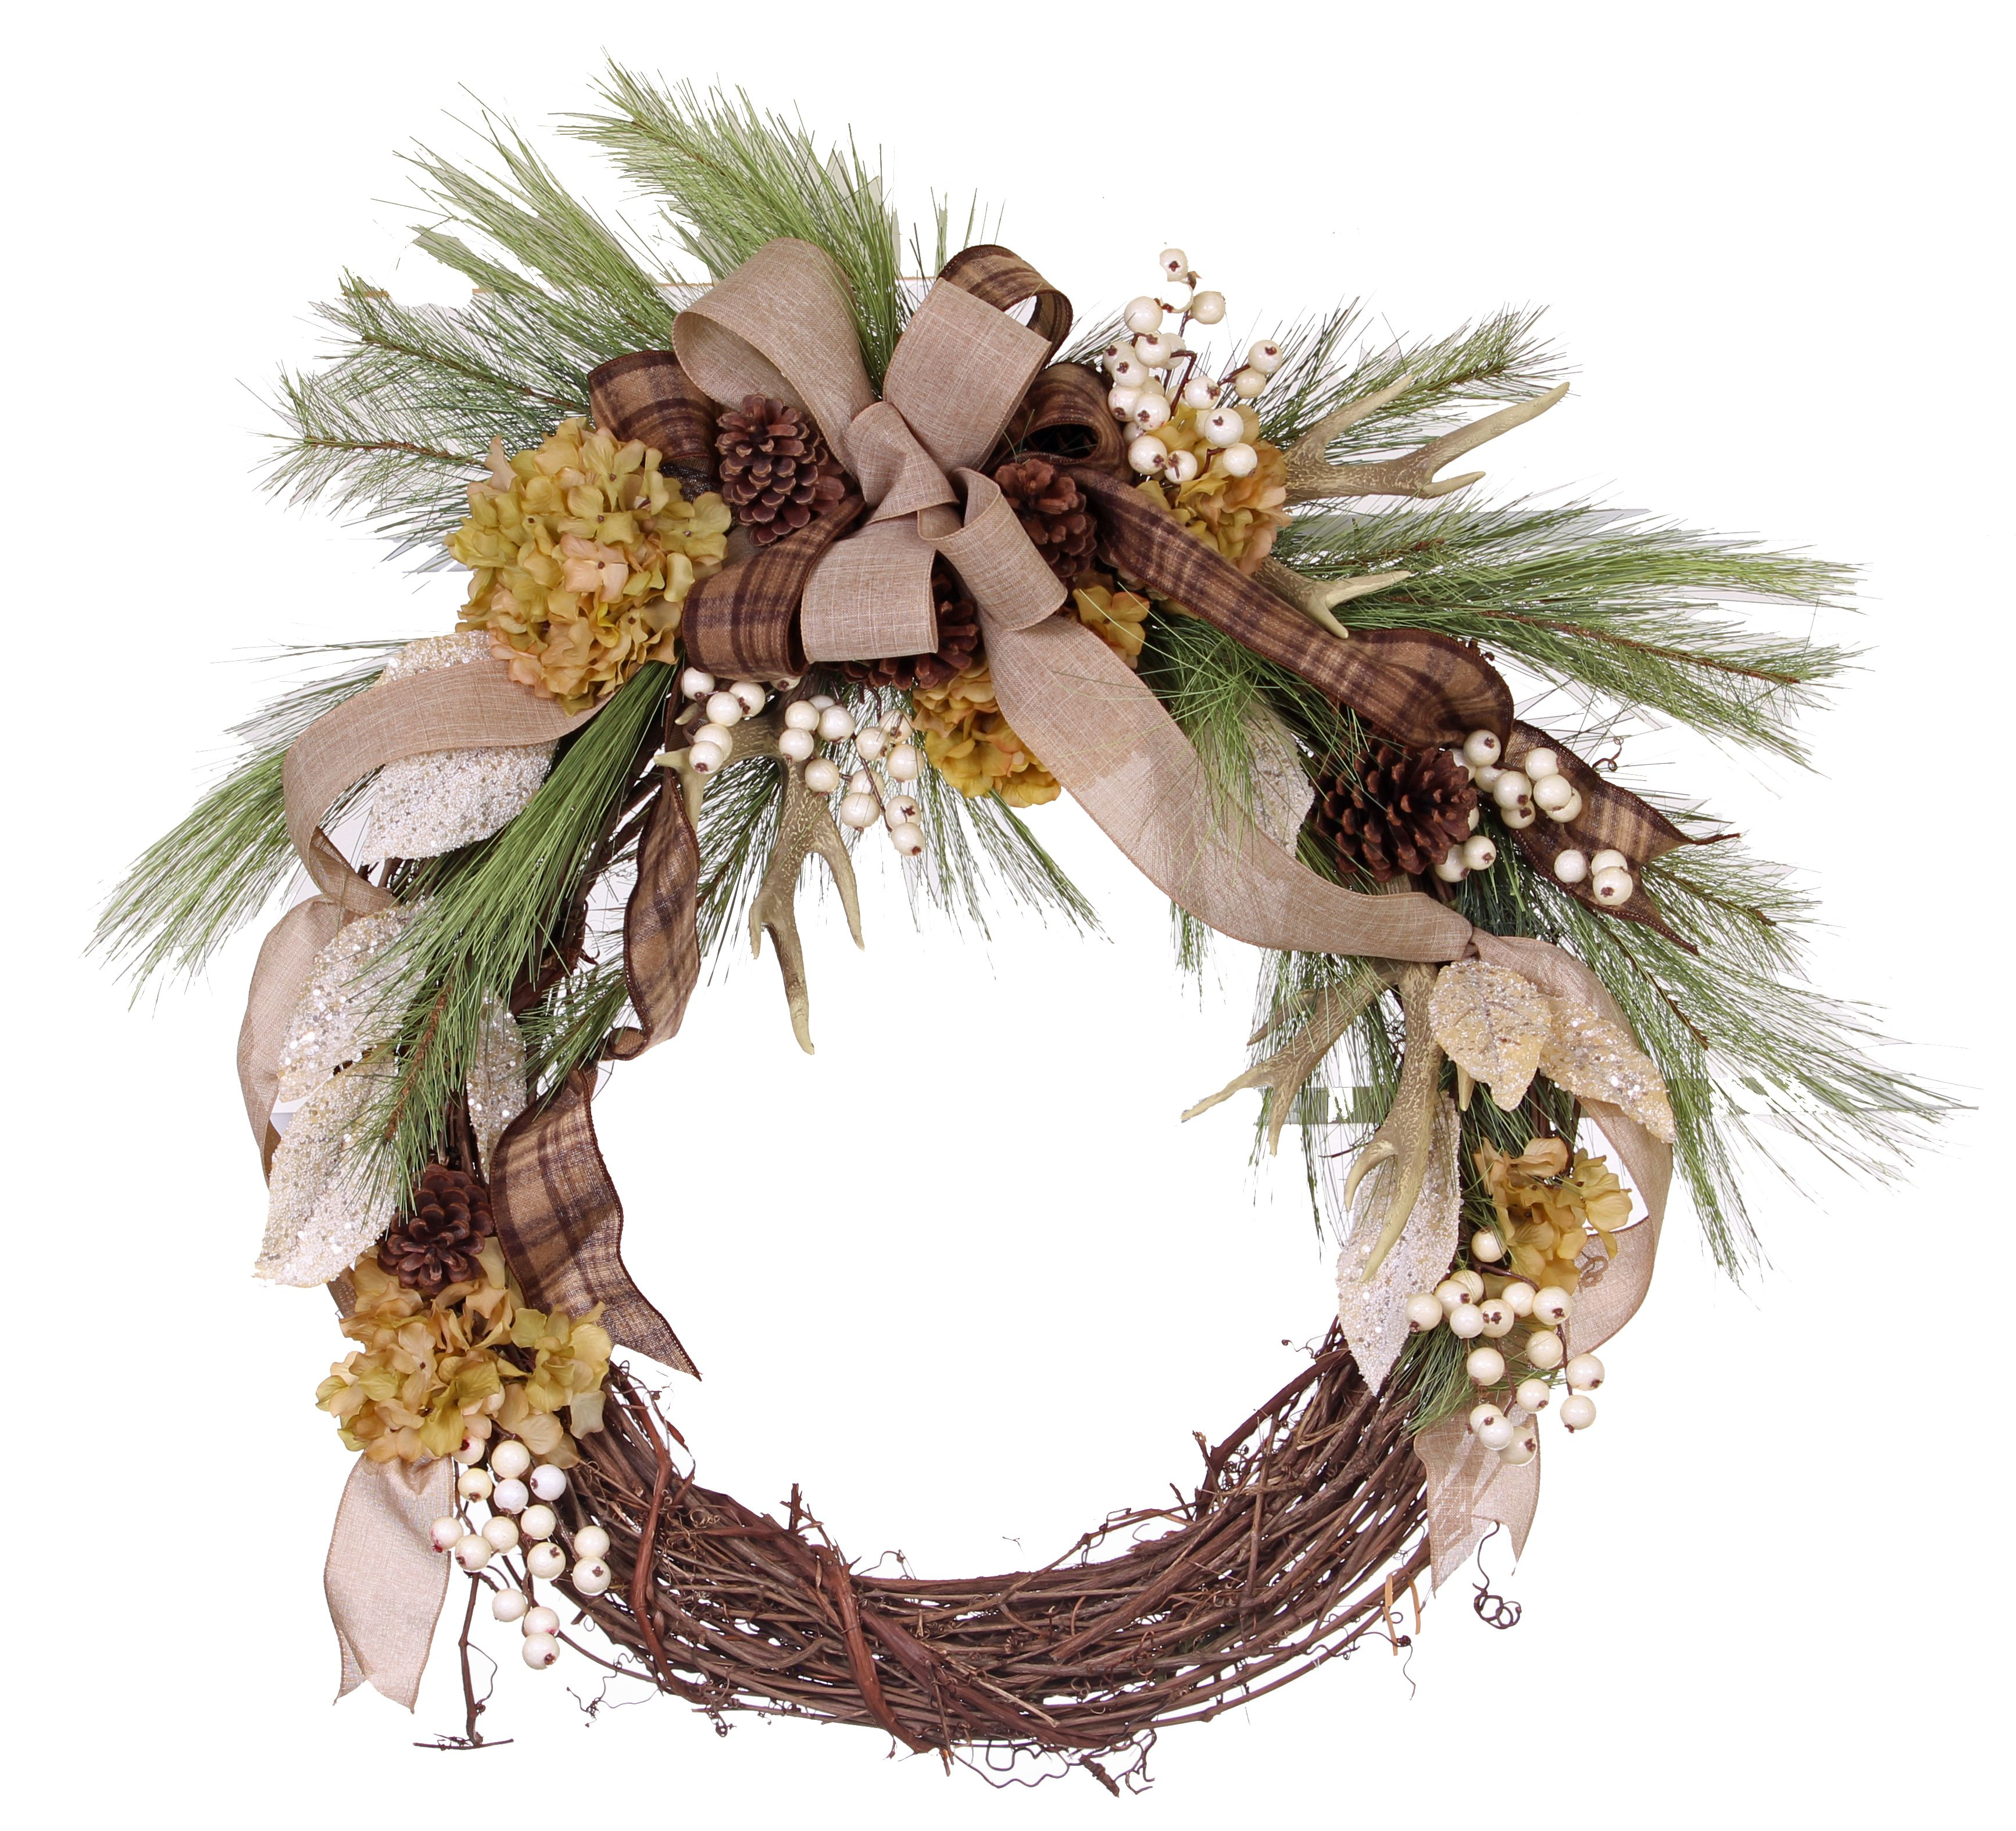 Design by dusky turner north american wholesale florist